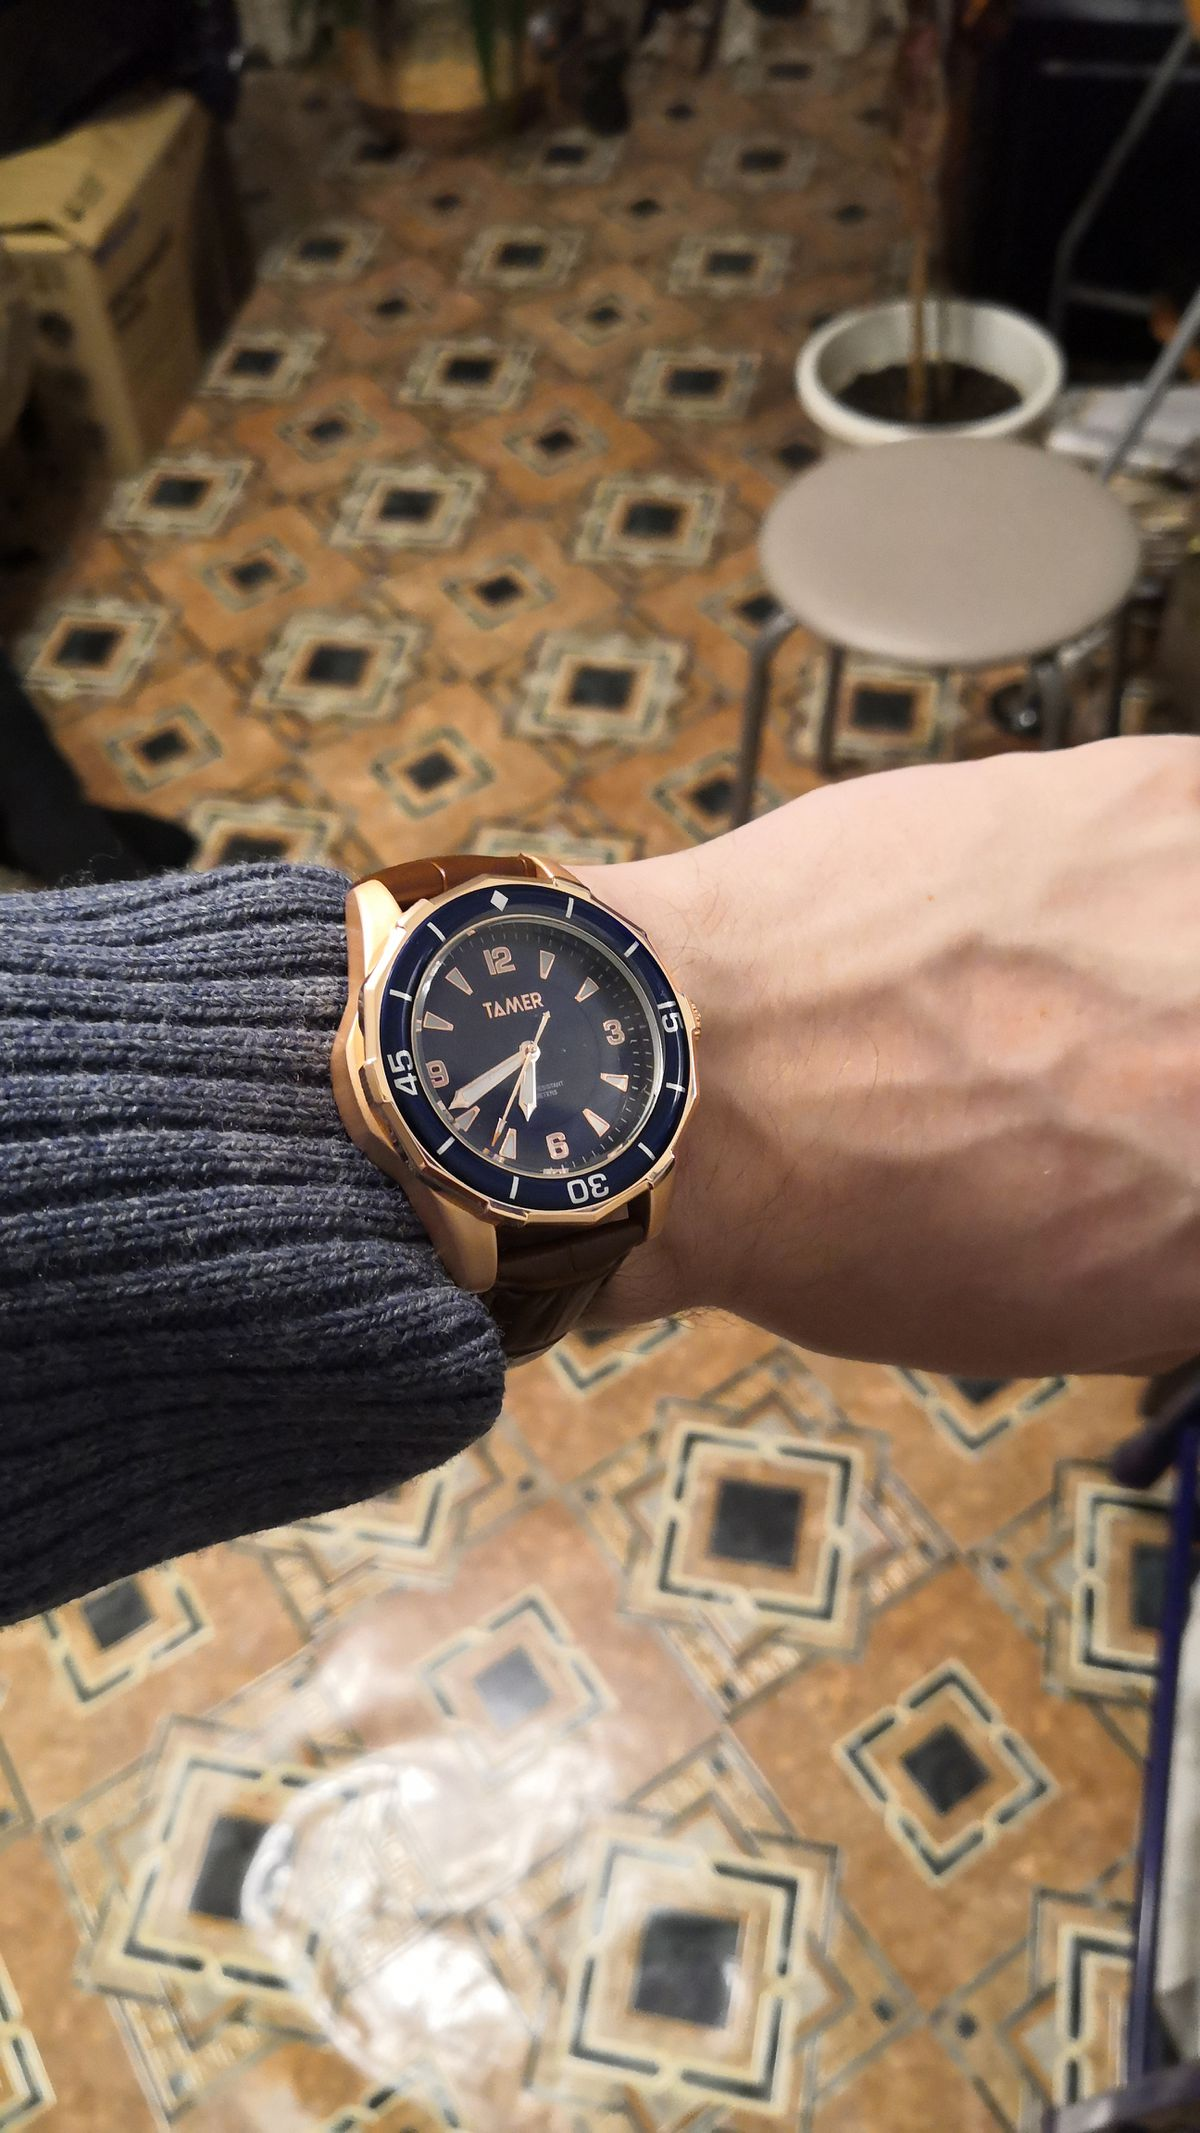 Покупала часы мужу